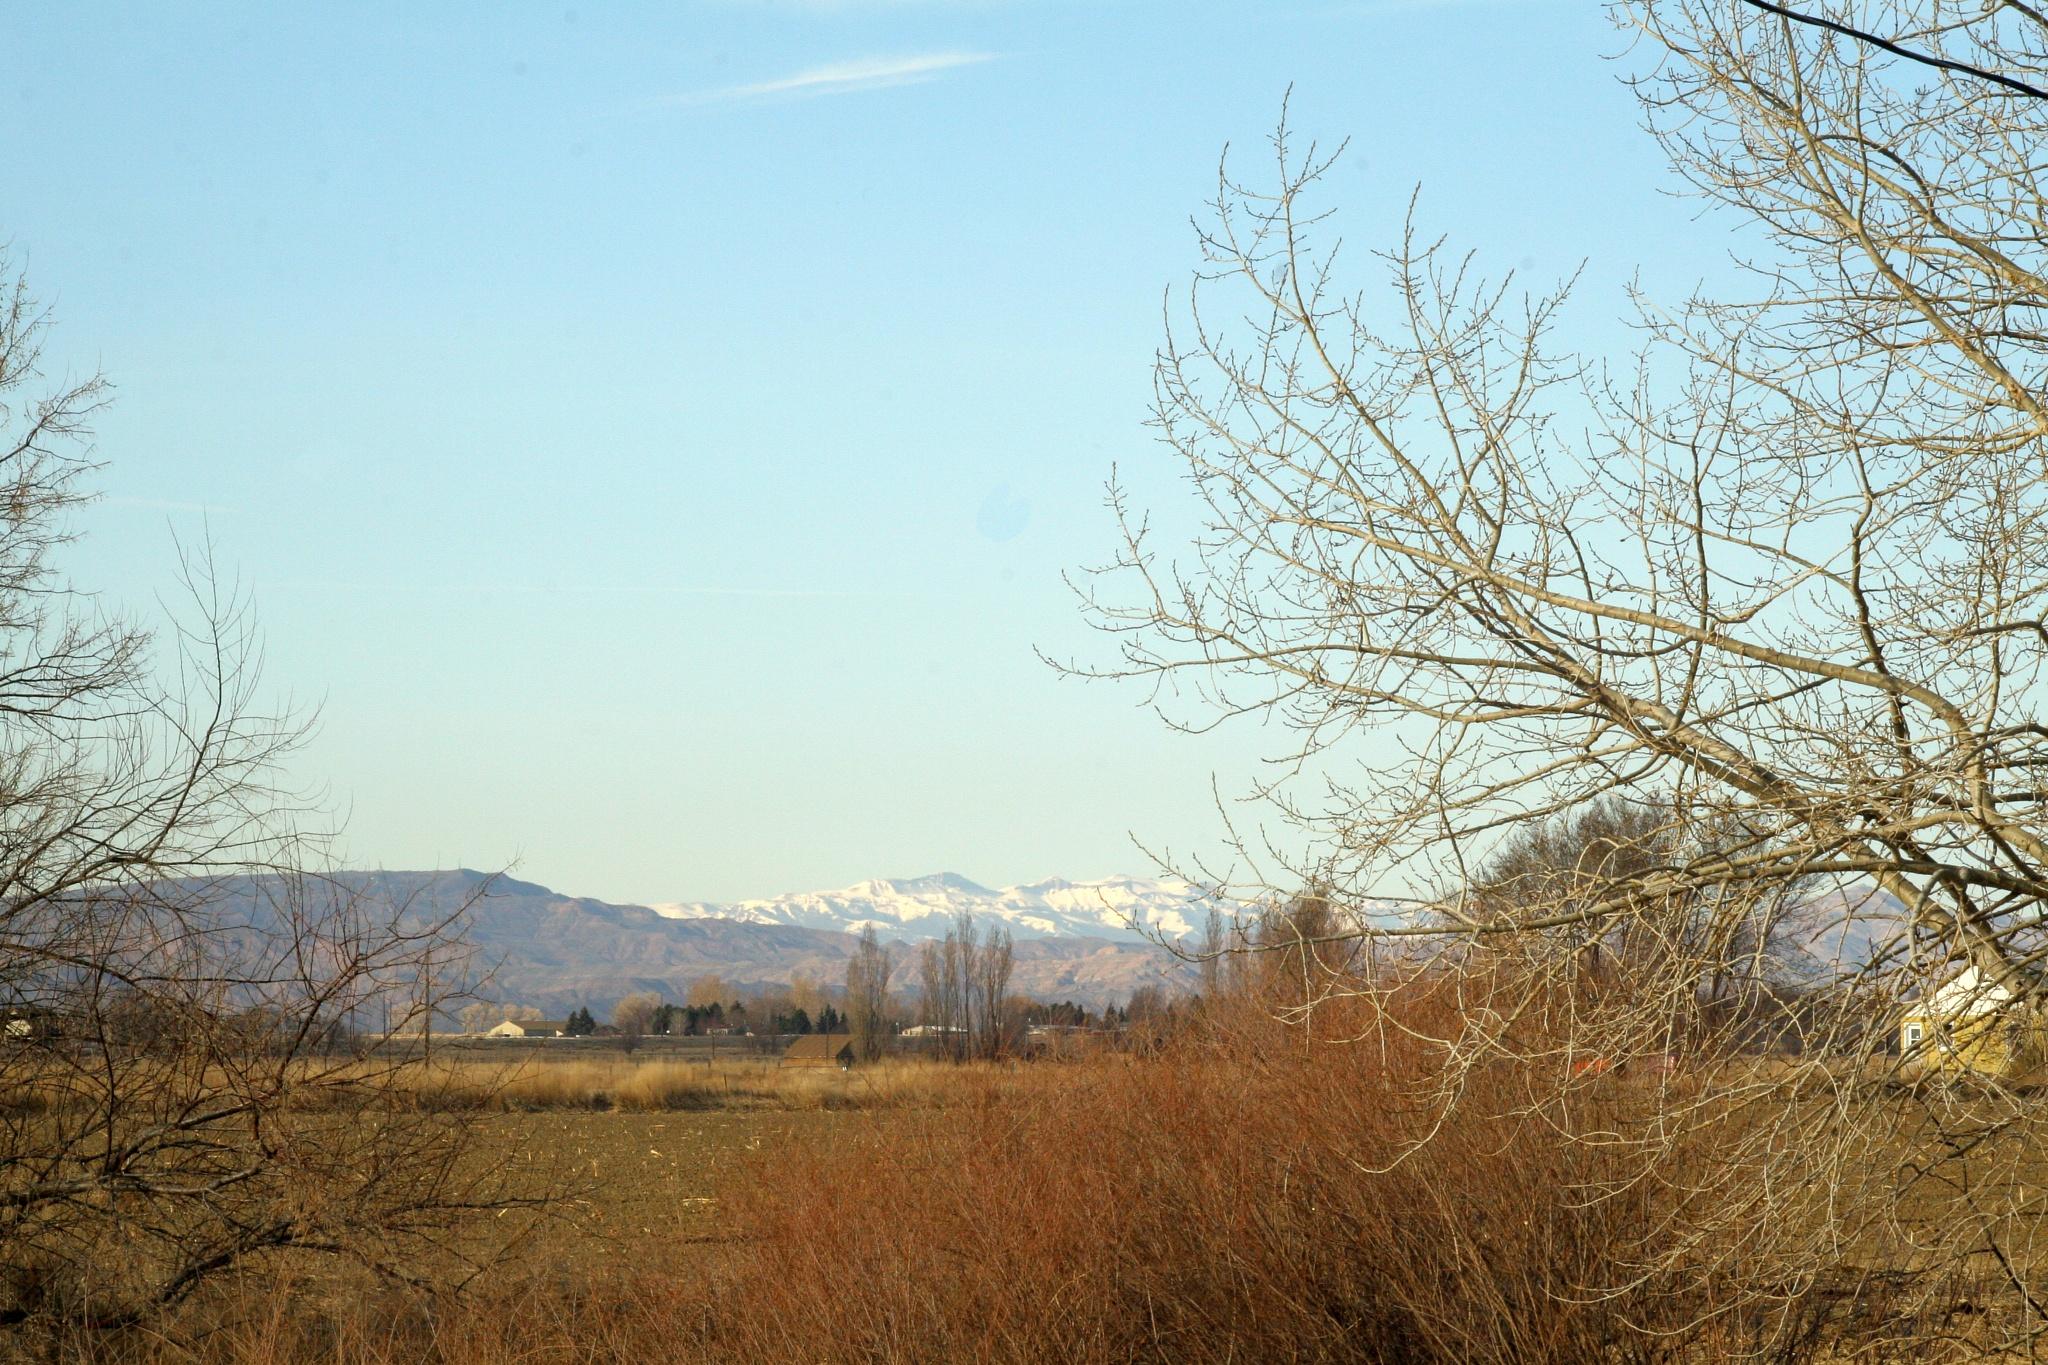 Winter Scene in Wyoming by jimw